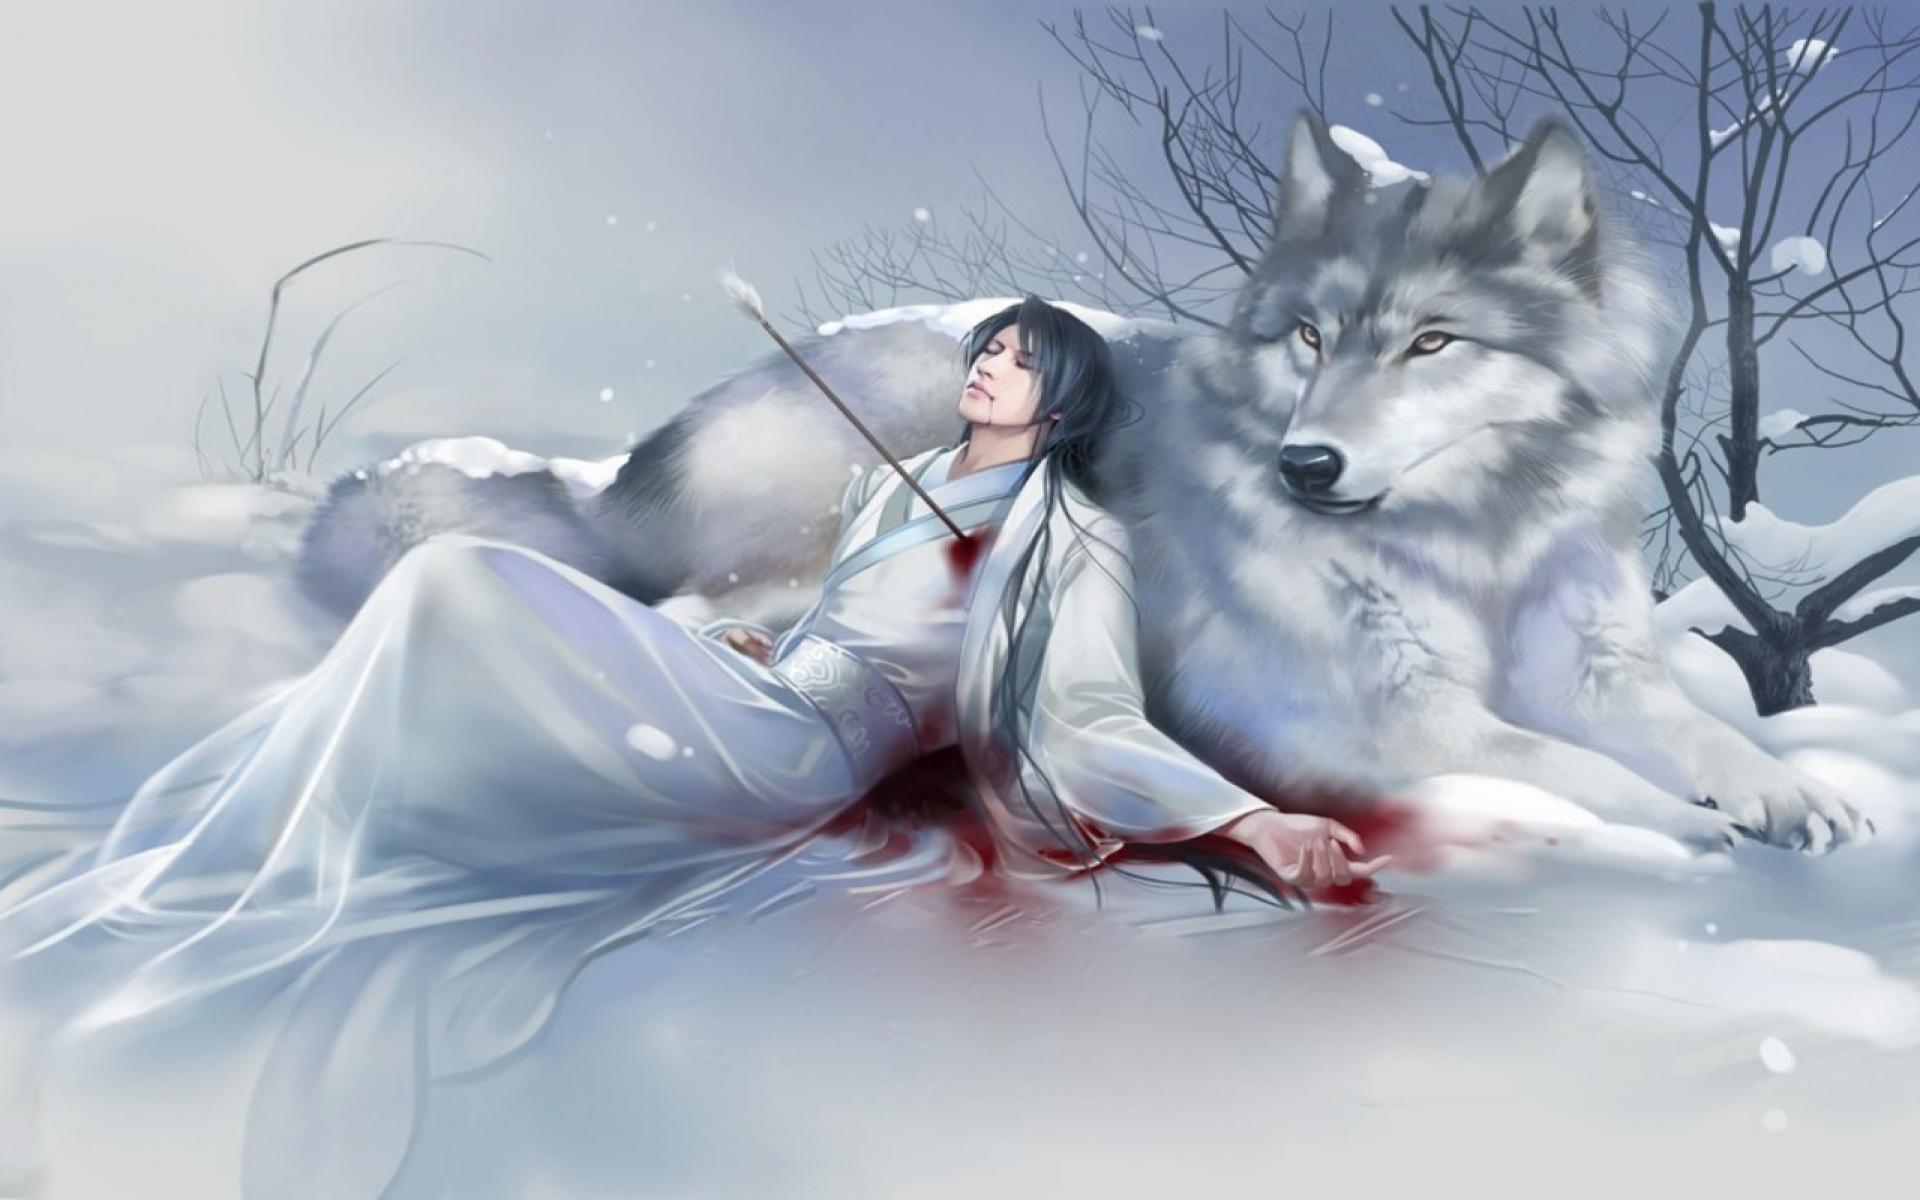 Anime wolf wallpaper wallpapertag - Anime wolf wallpaper ...